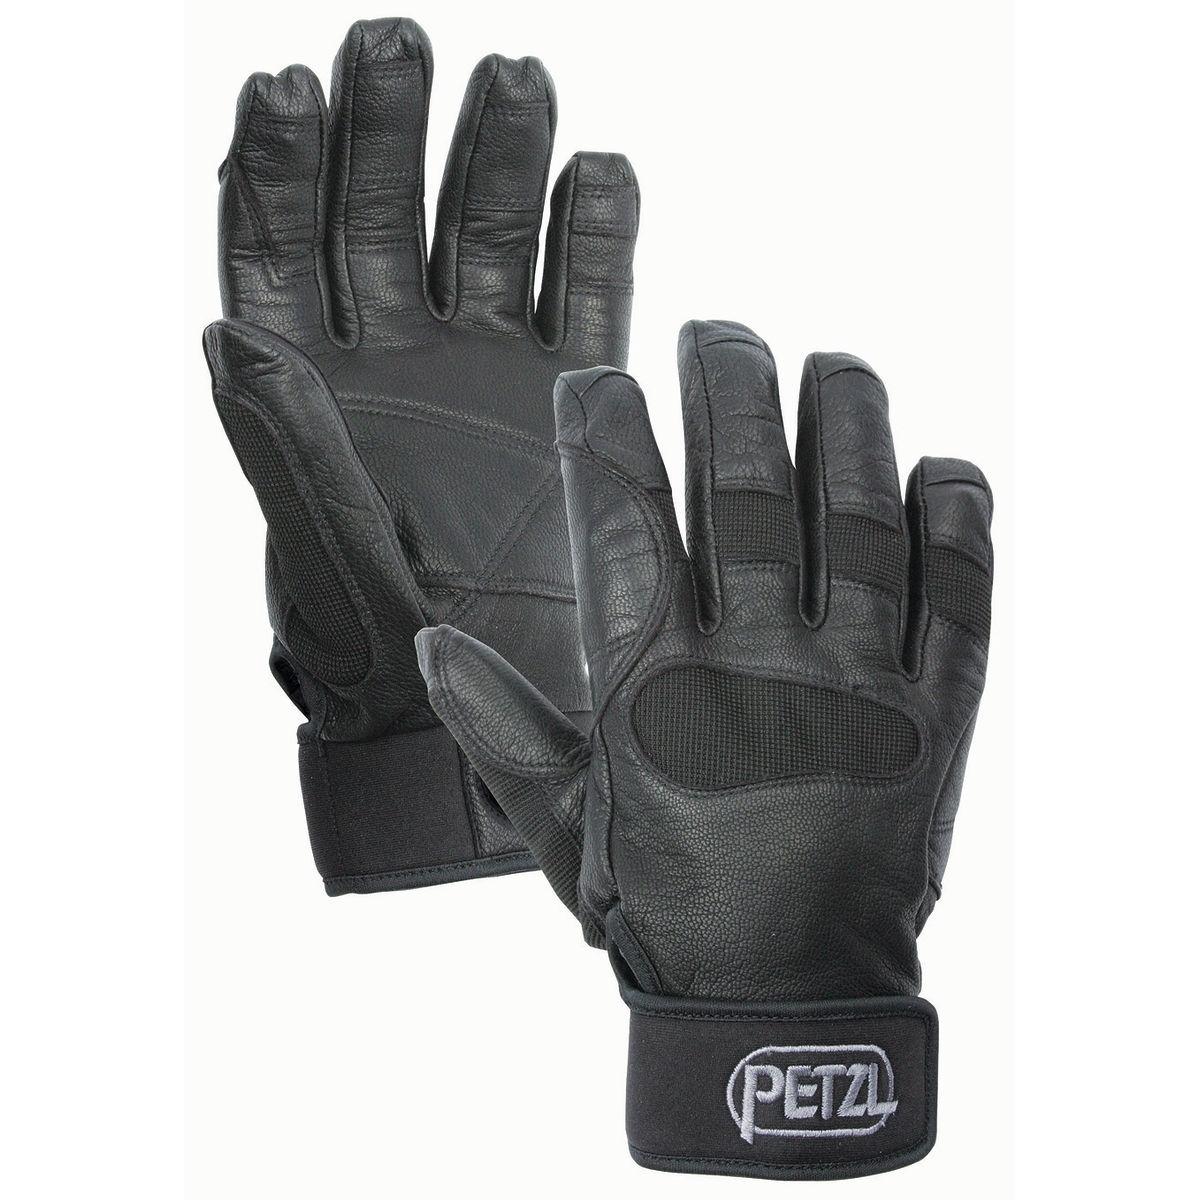 Foto de Petzl Cordex Plus Glove - black